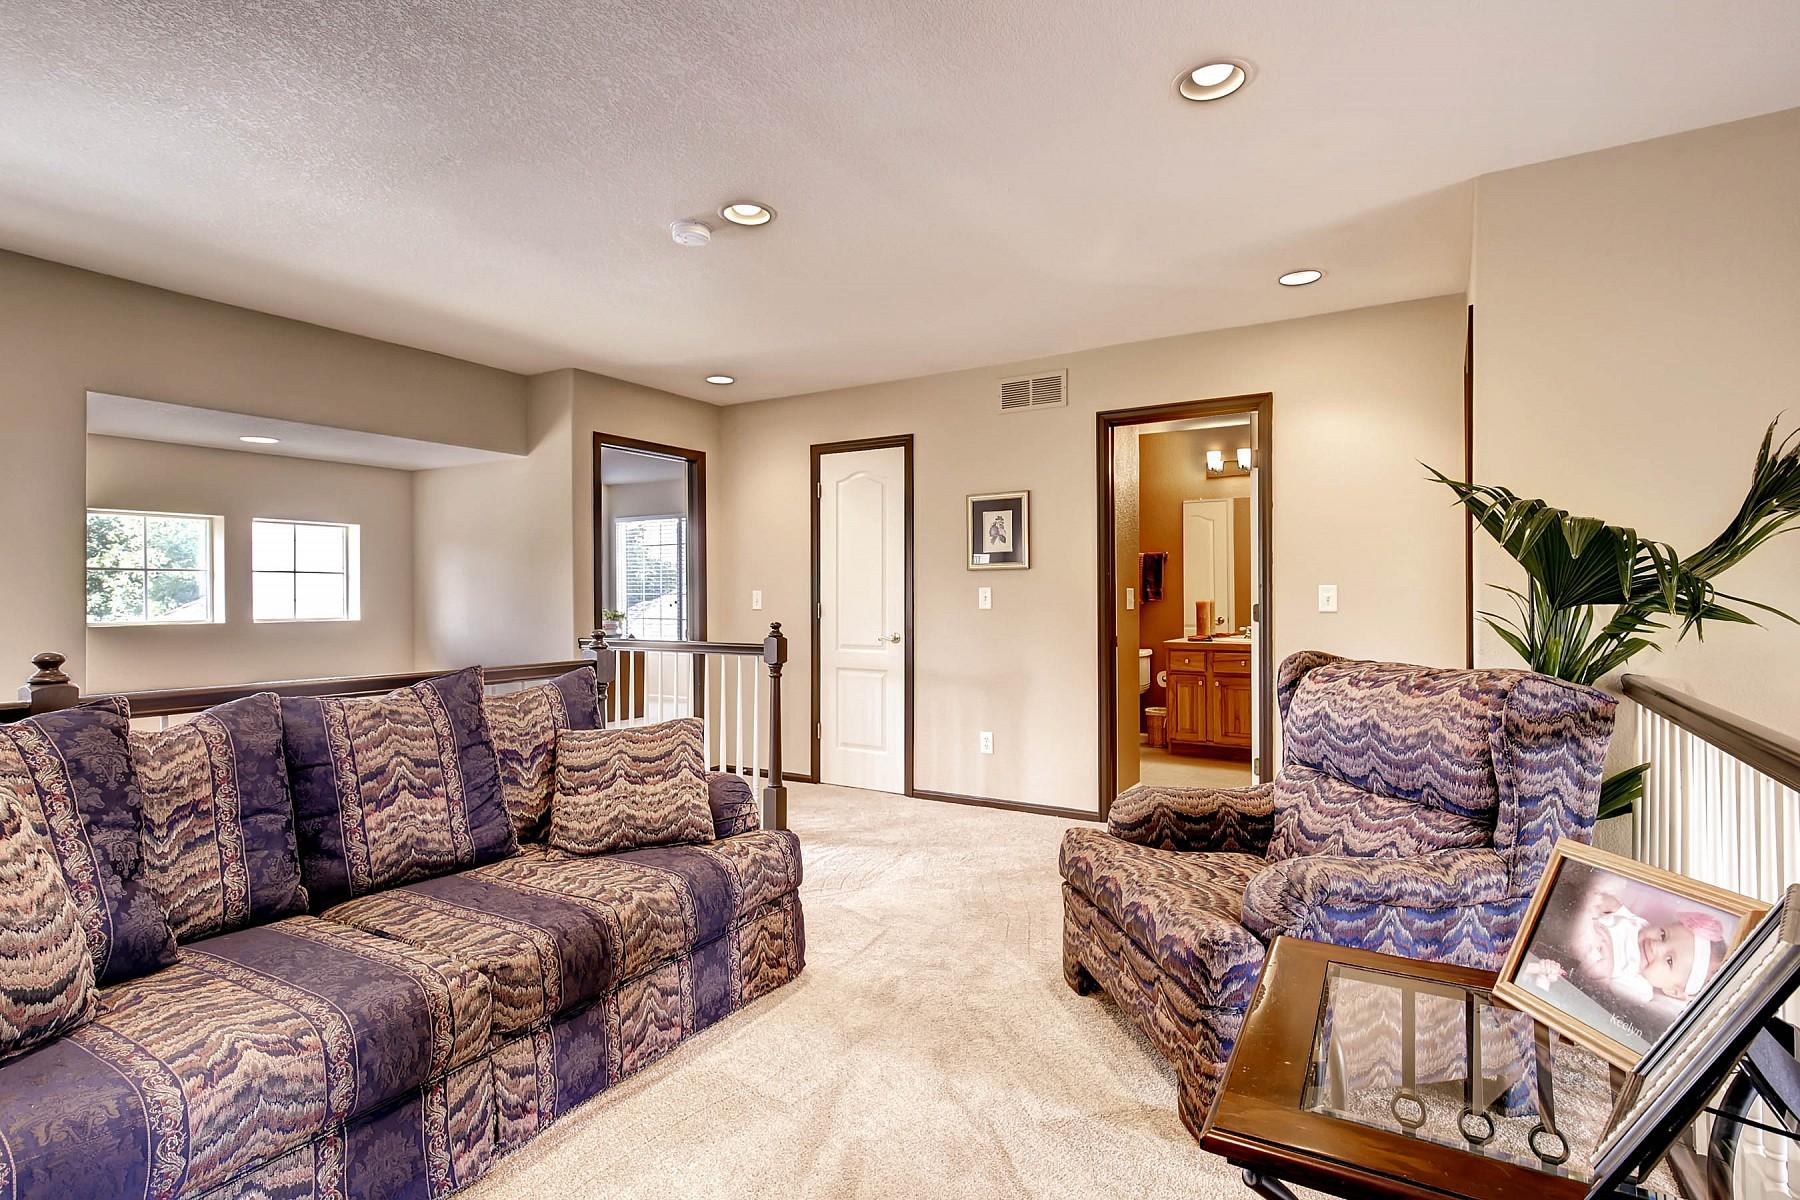 6900 West Grant Ranch Boulevard #8, Littleton, CO 80123